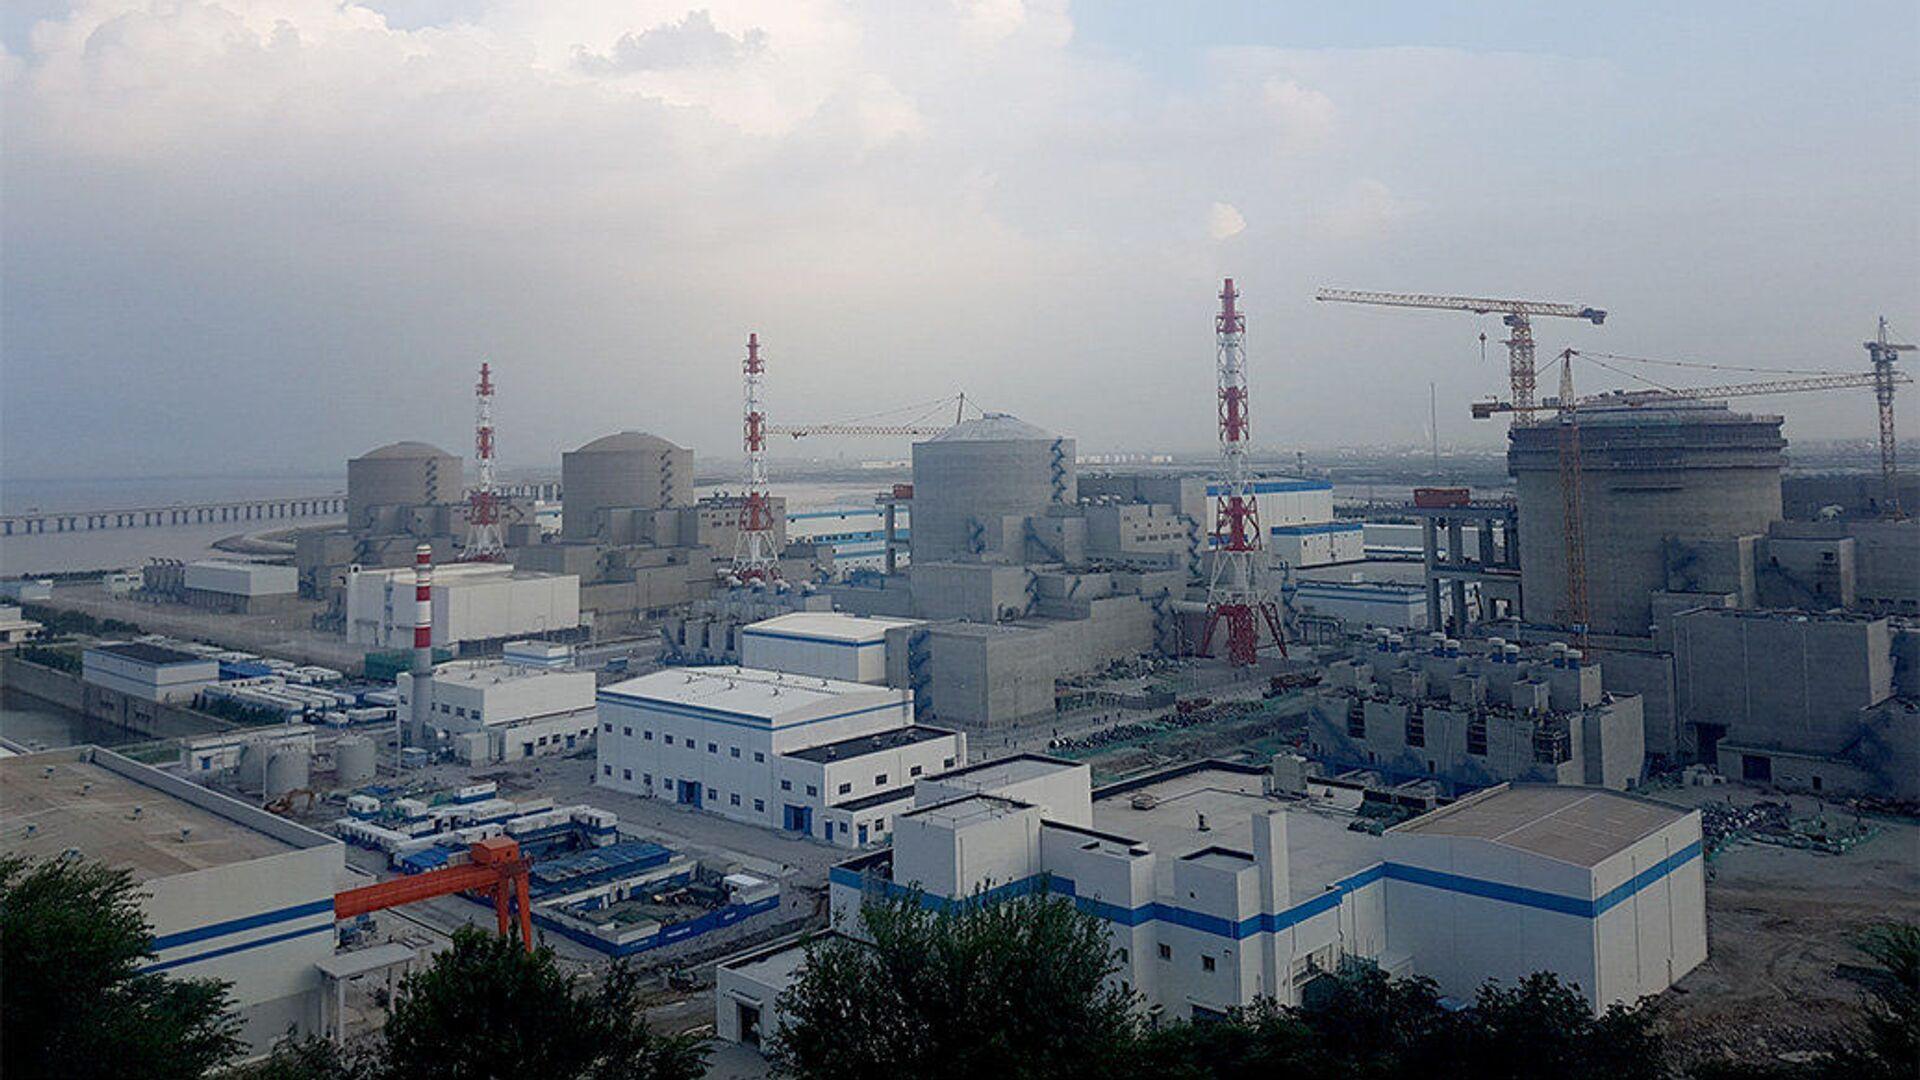 La centrale nucleare di Tianwan, Guandong, Cina - Sputnik Italia, 1920, 16.09.2021